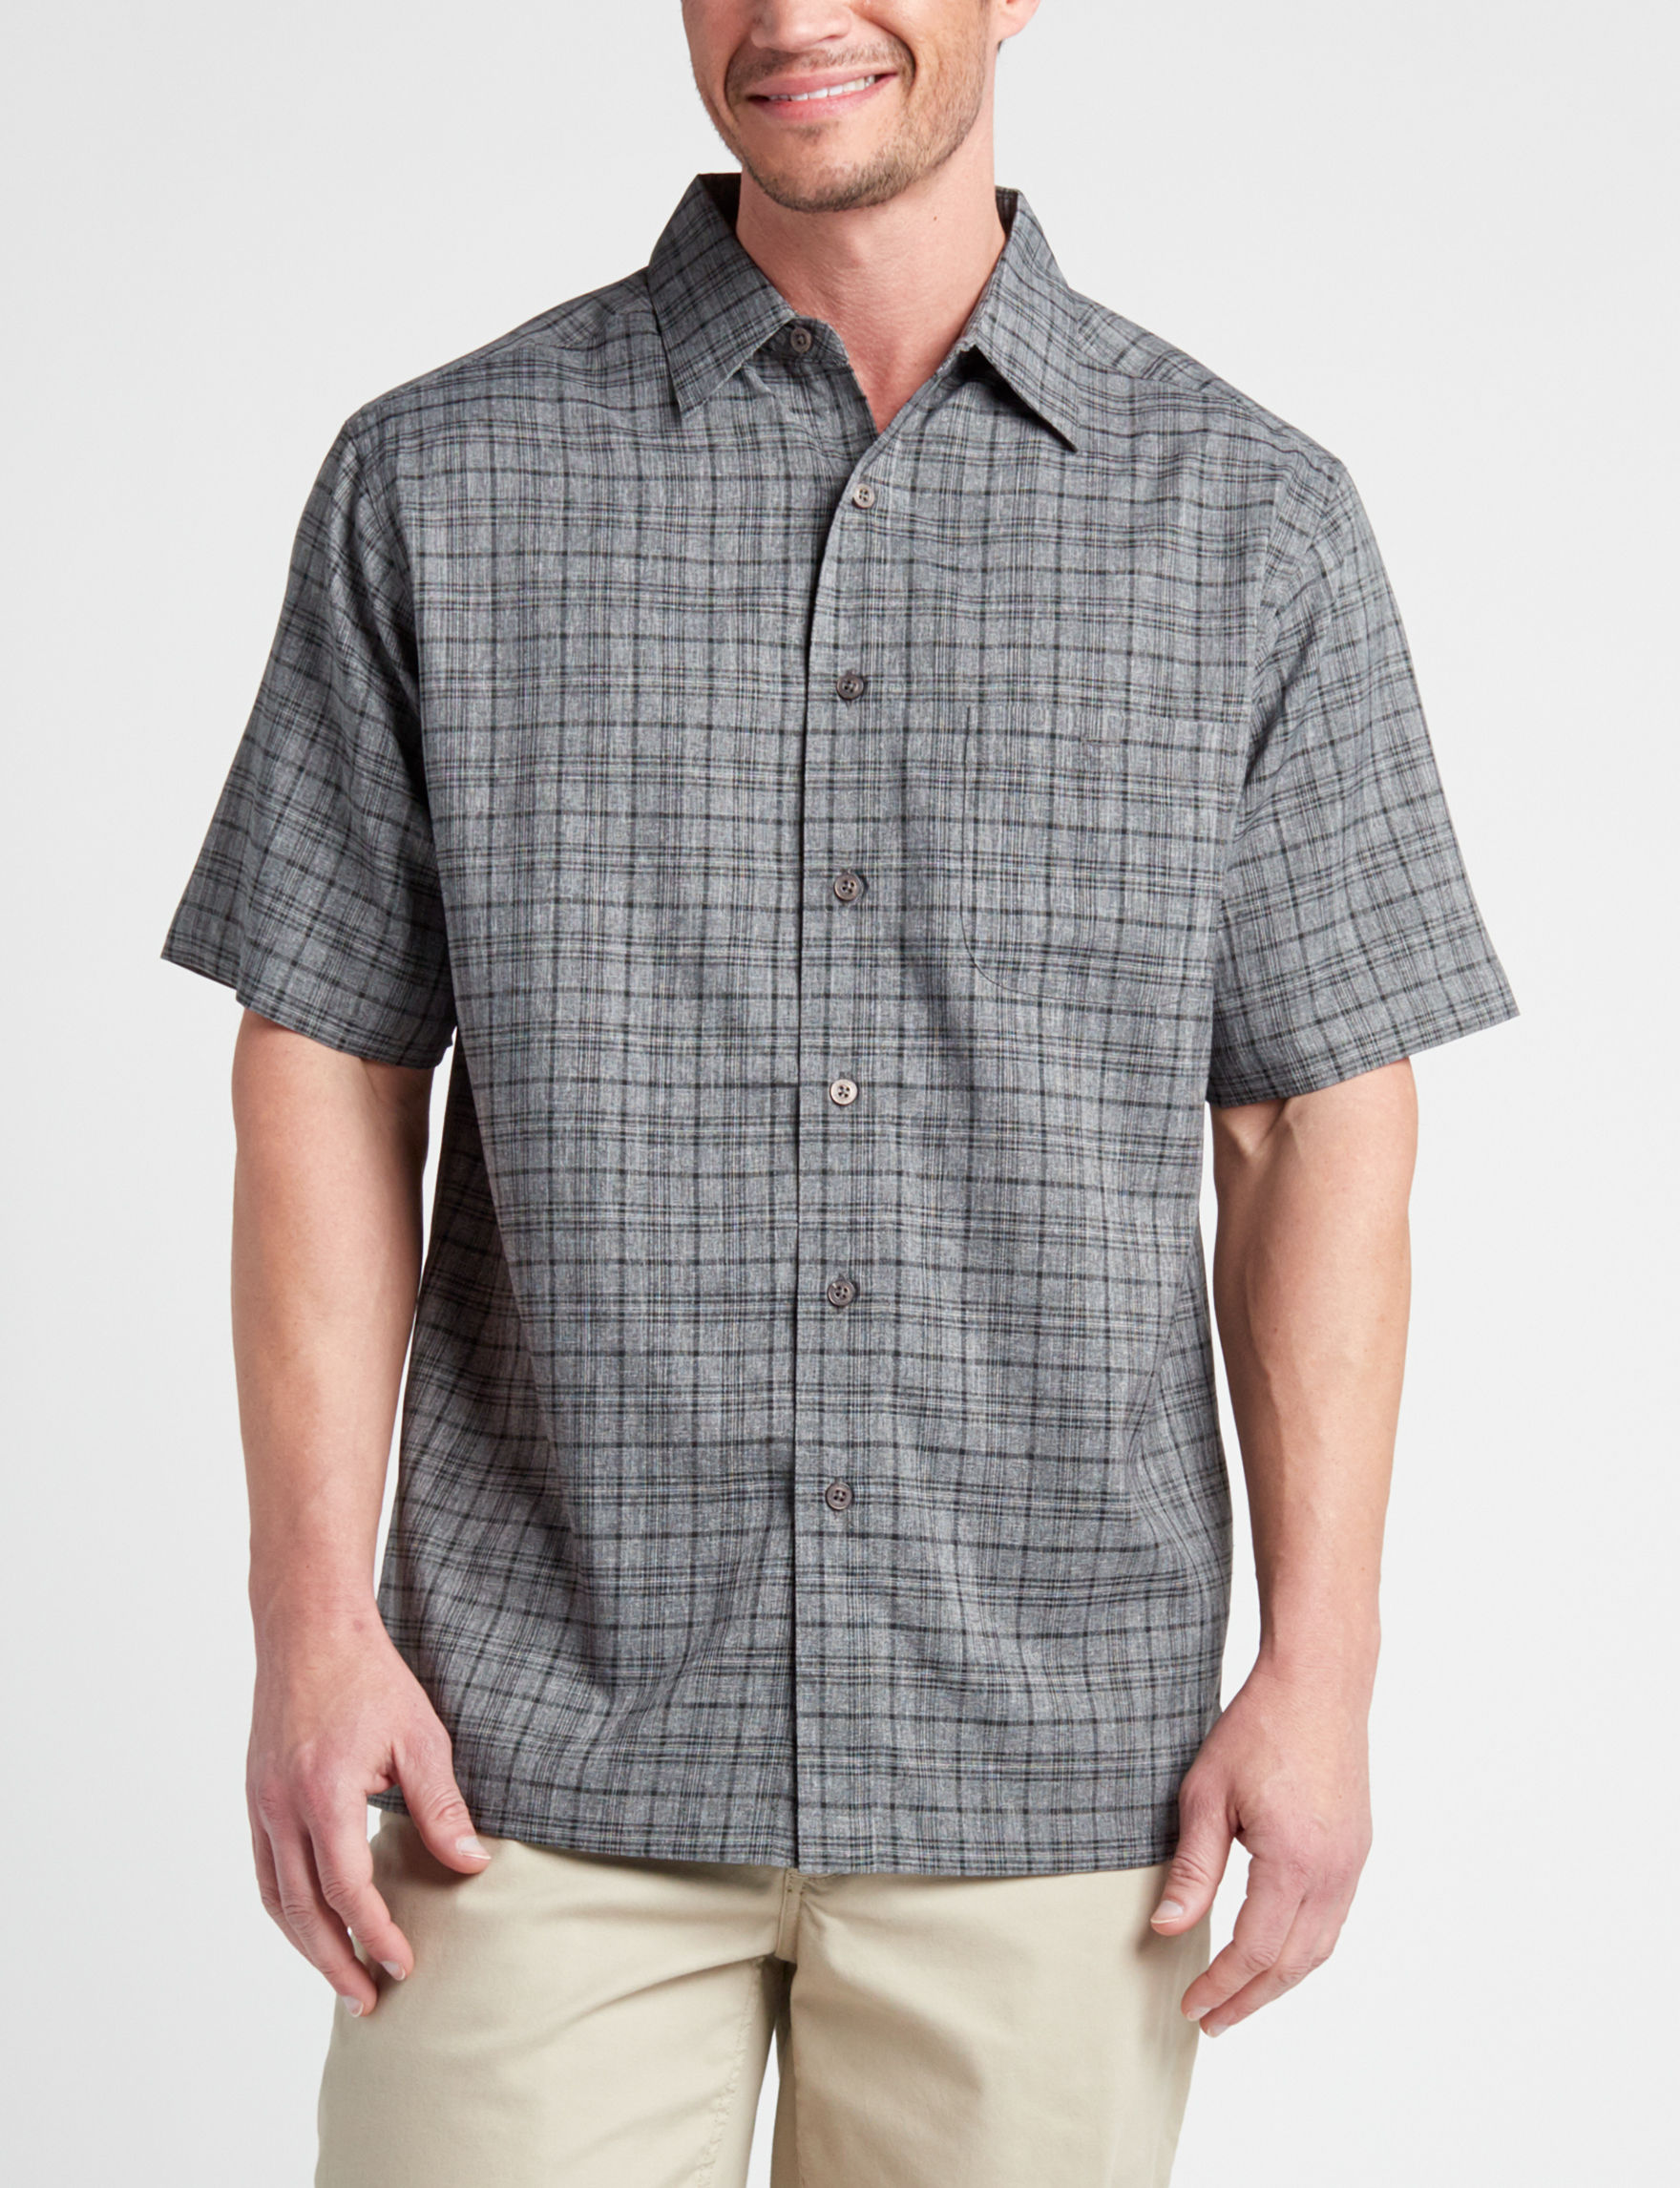 Haggar Grey / Black Casual Button Down Shirts